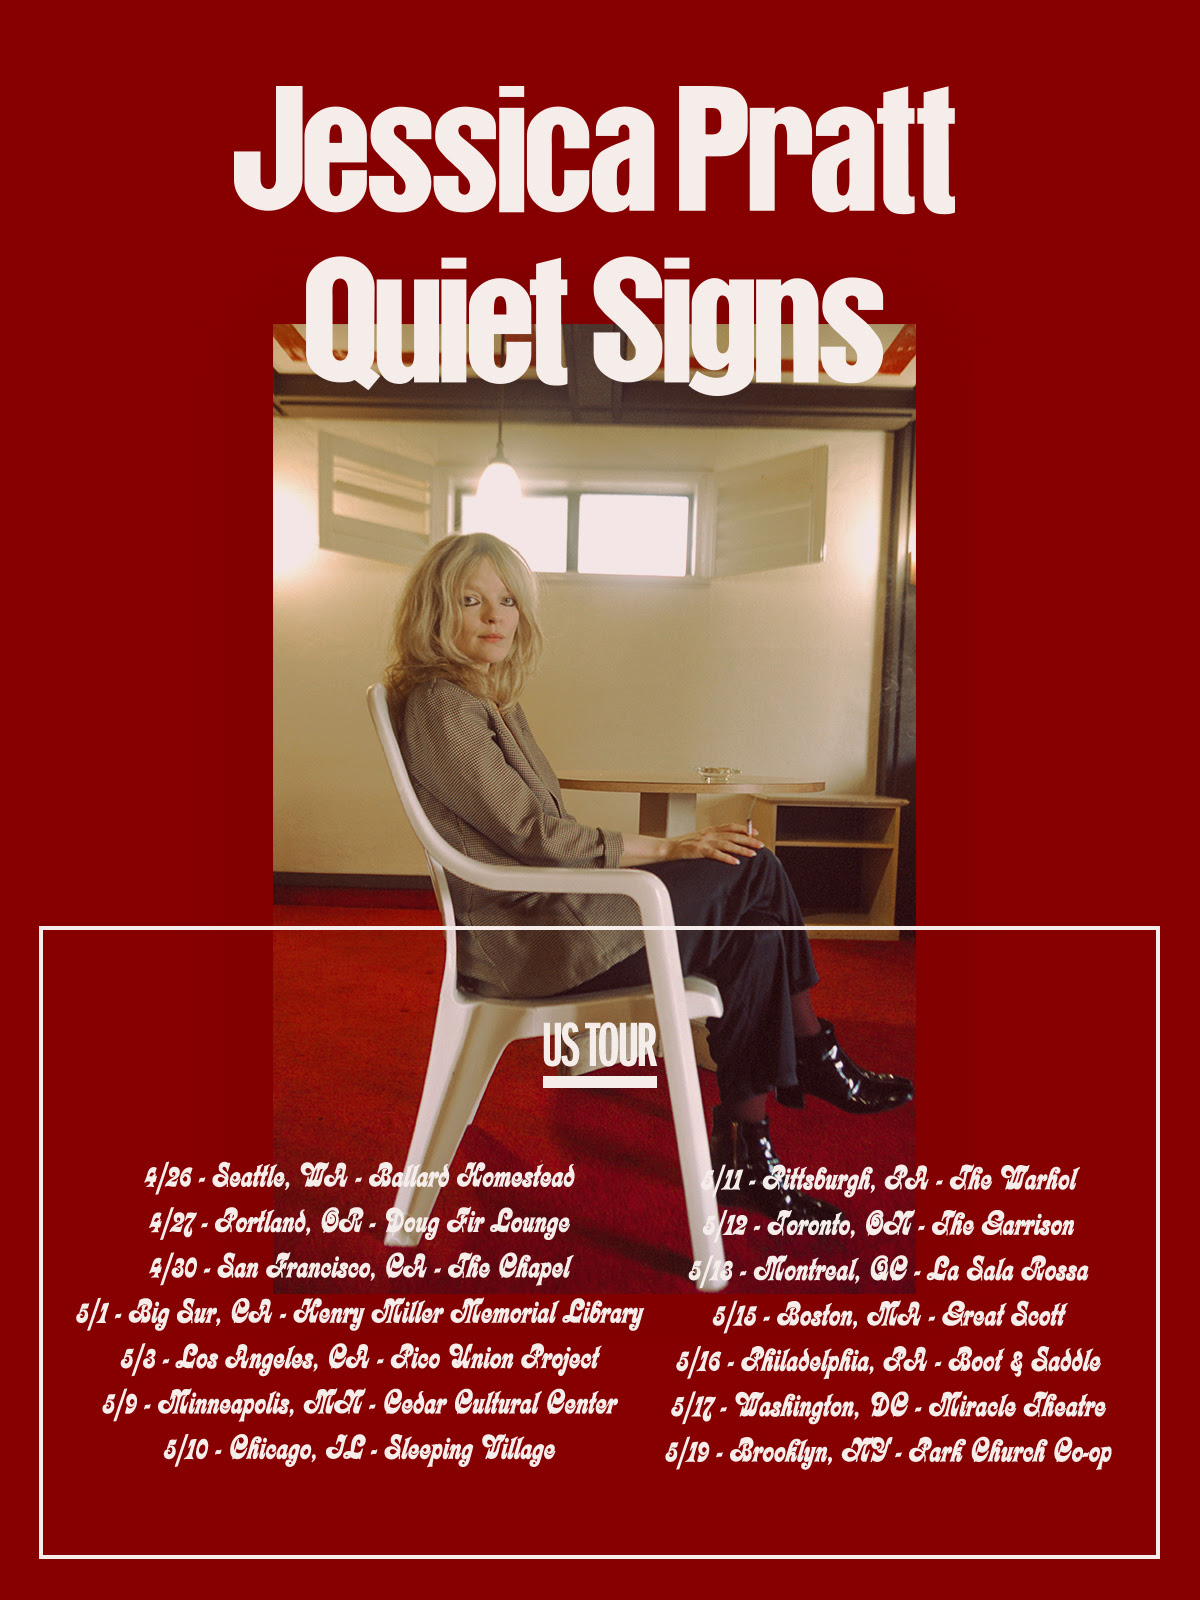 Jessica Pratt Tour Poster